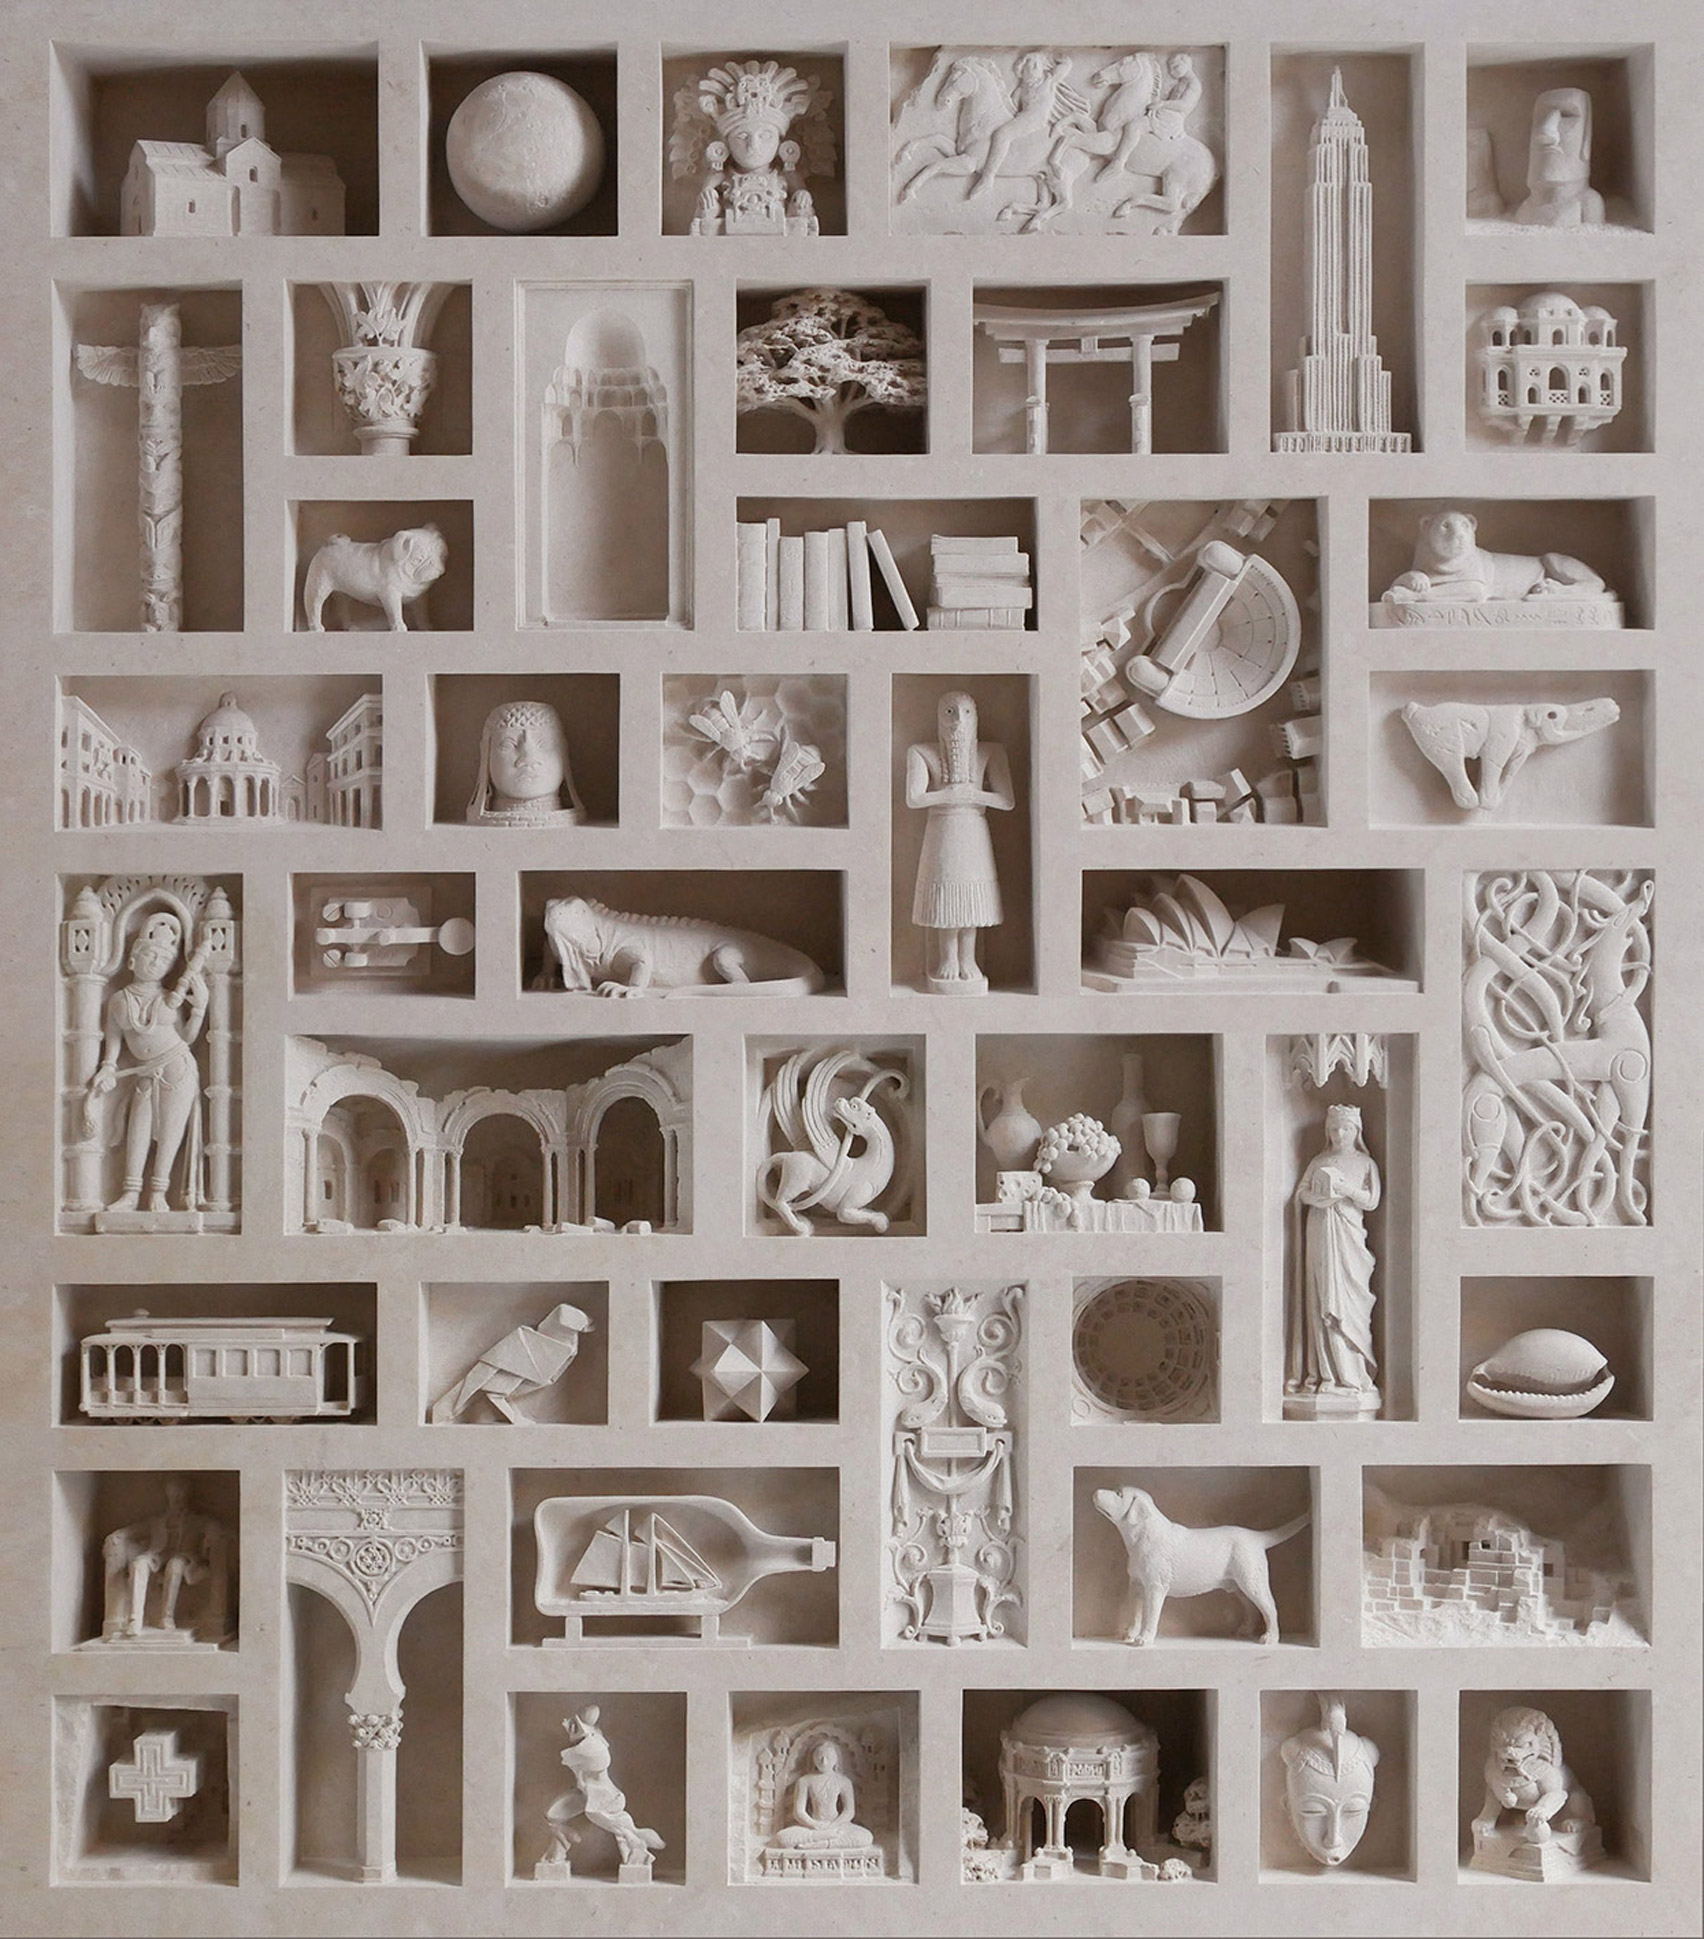 Architectural sculptures by Matthew Simmonds